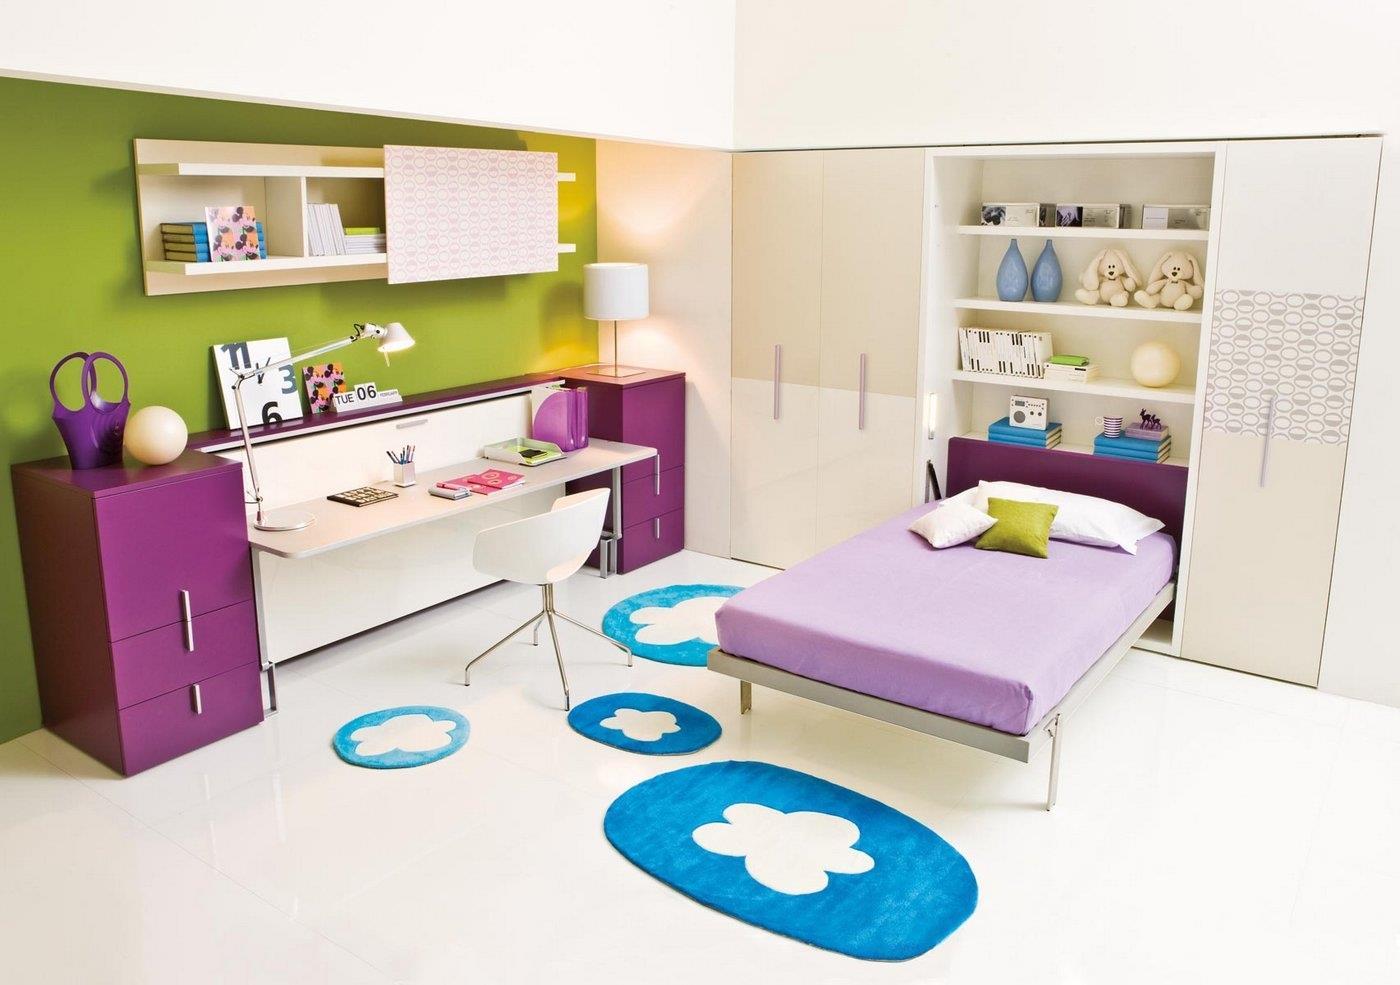 9-mobila-inteligenta-violet-camera-copii